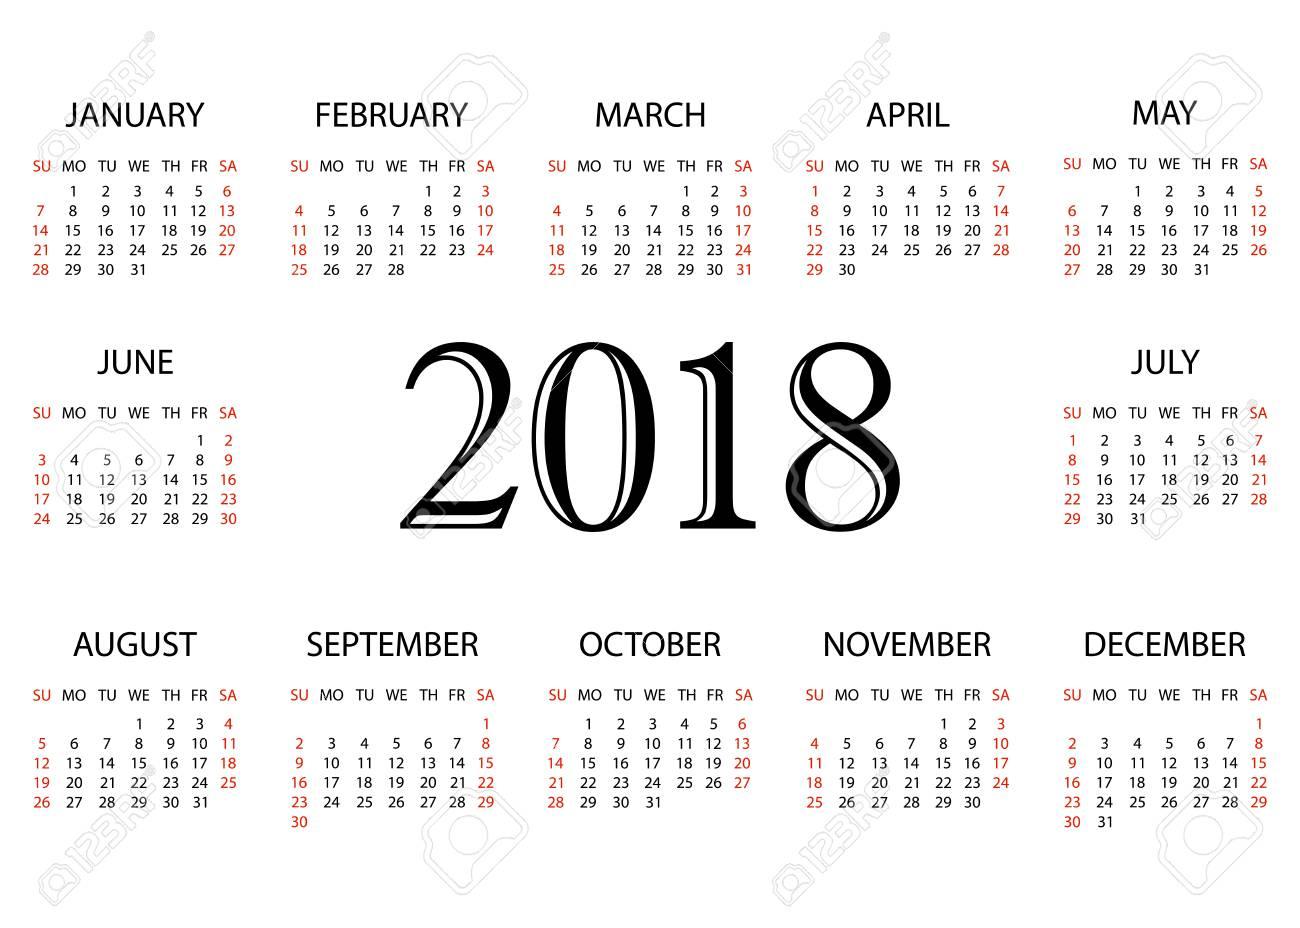 calendar 2018 simple calendar template for year 2018 white background vector illustration stock